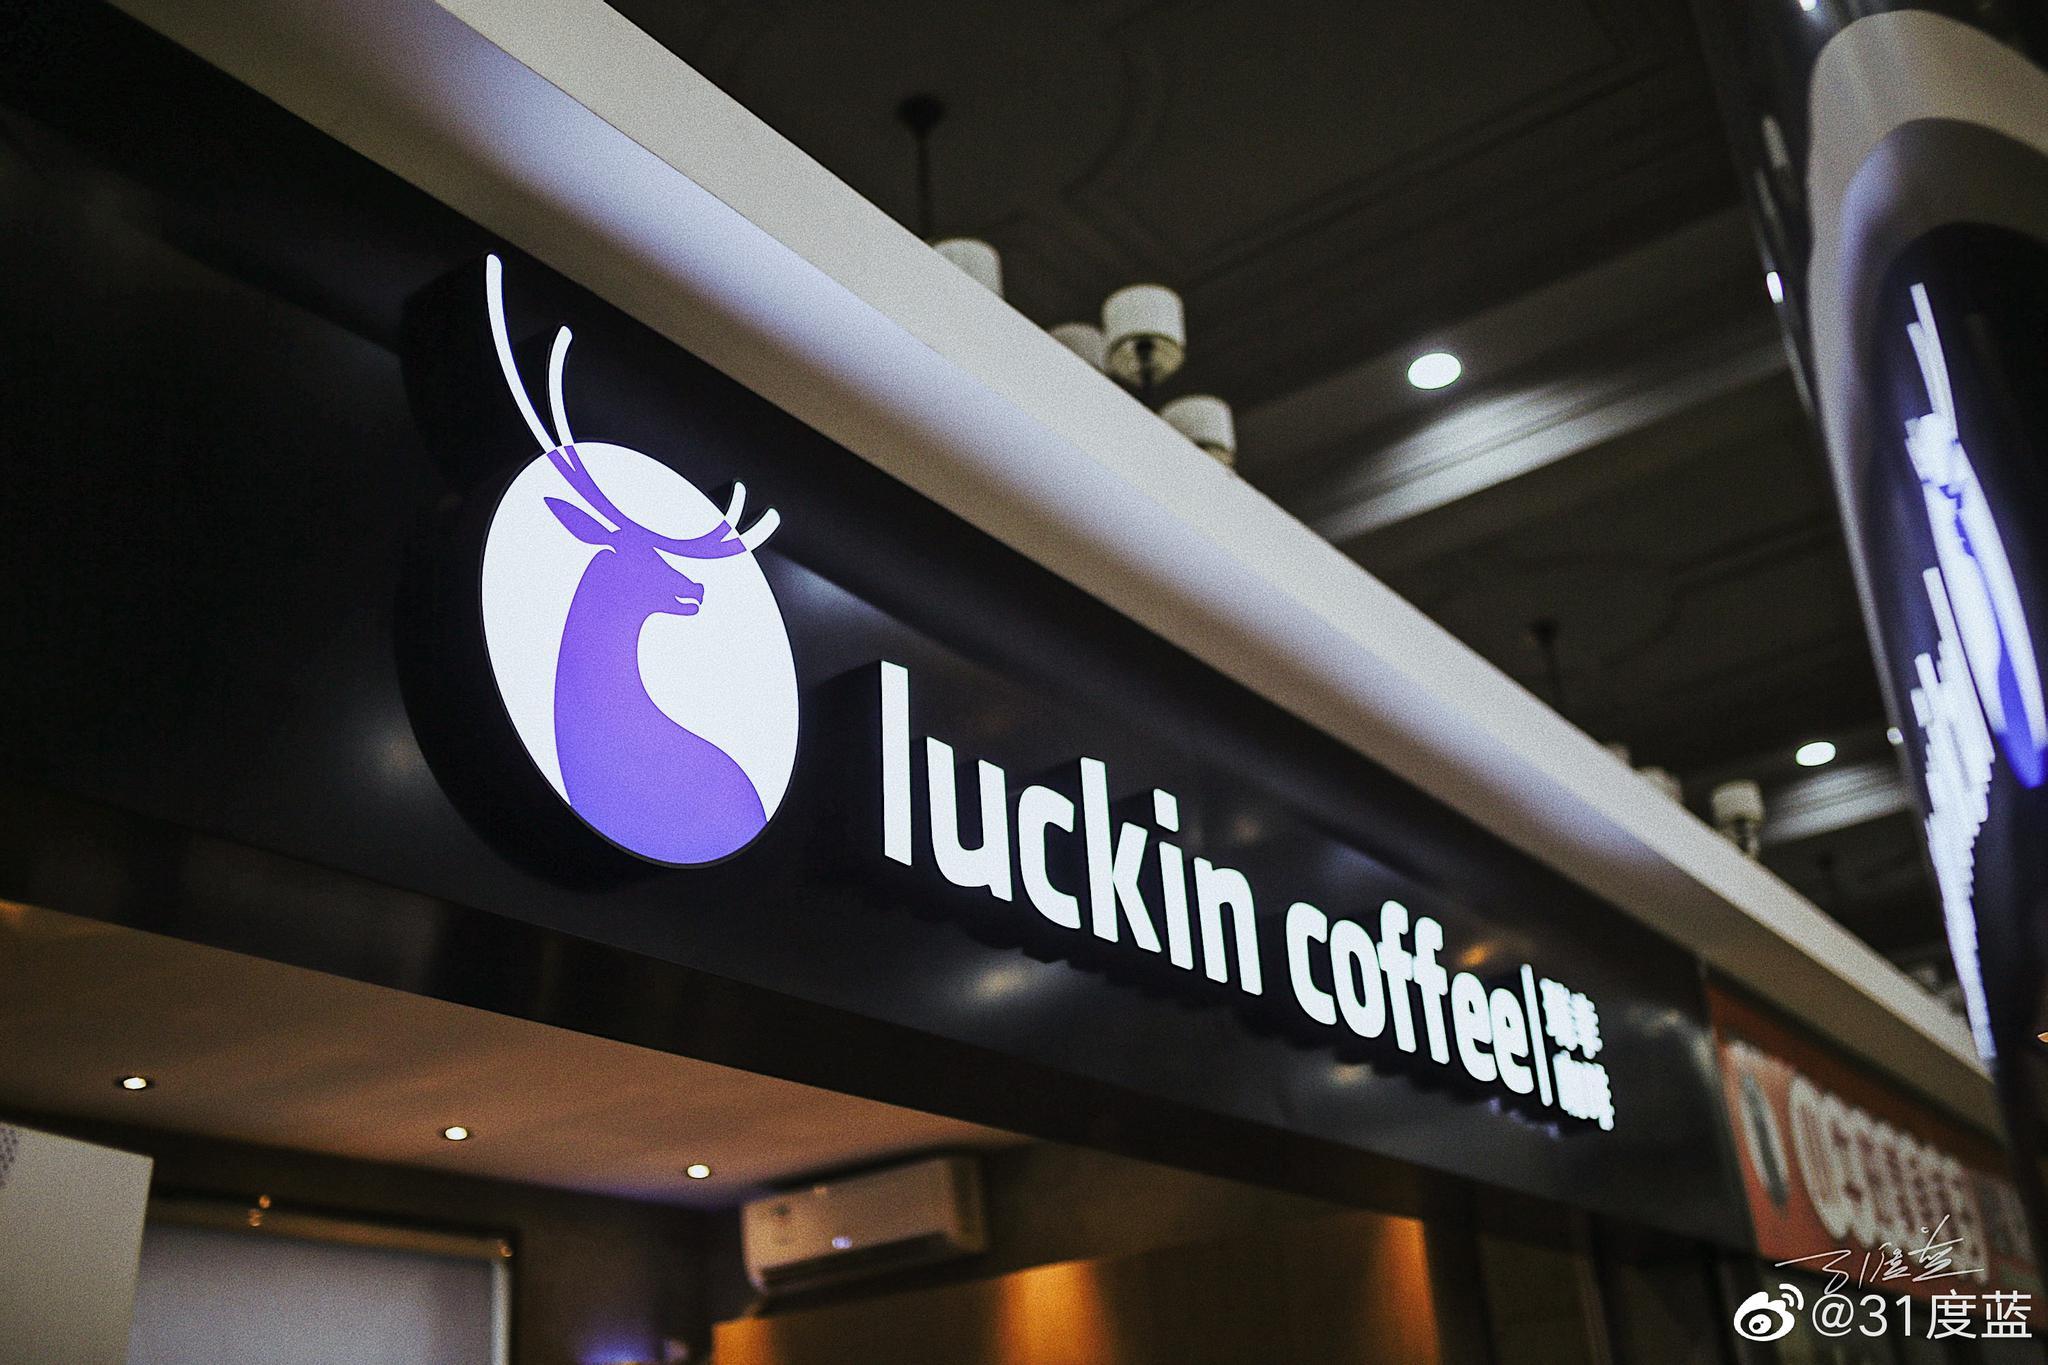 店铺/ luckin coffee